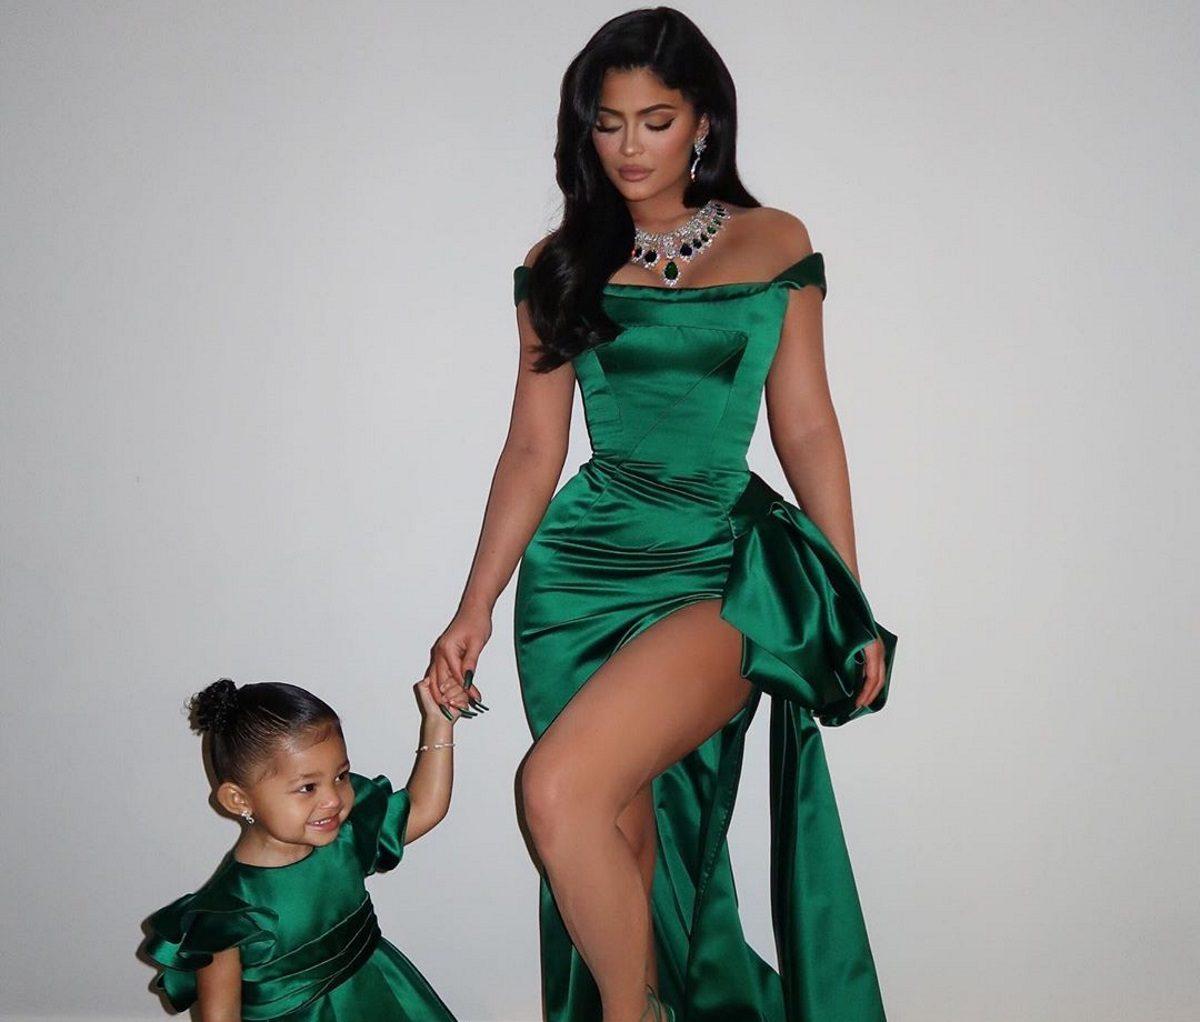 Kylie Jenner: Πάρτι στην Disney World για τα γενέθλια της κόρης της, Stormi! [pics,vid] | tlife.gr